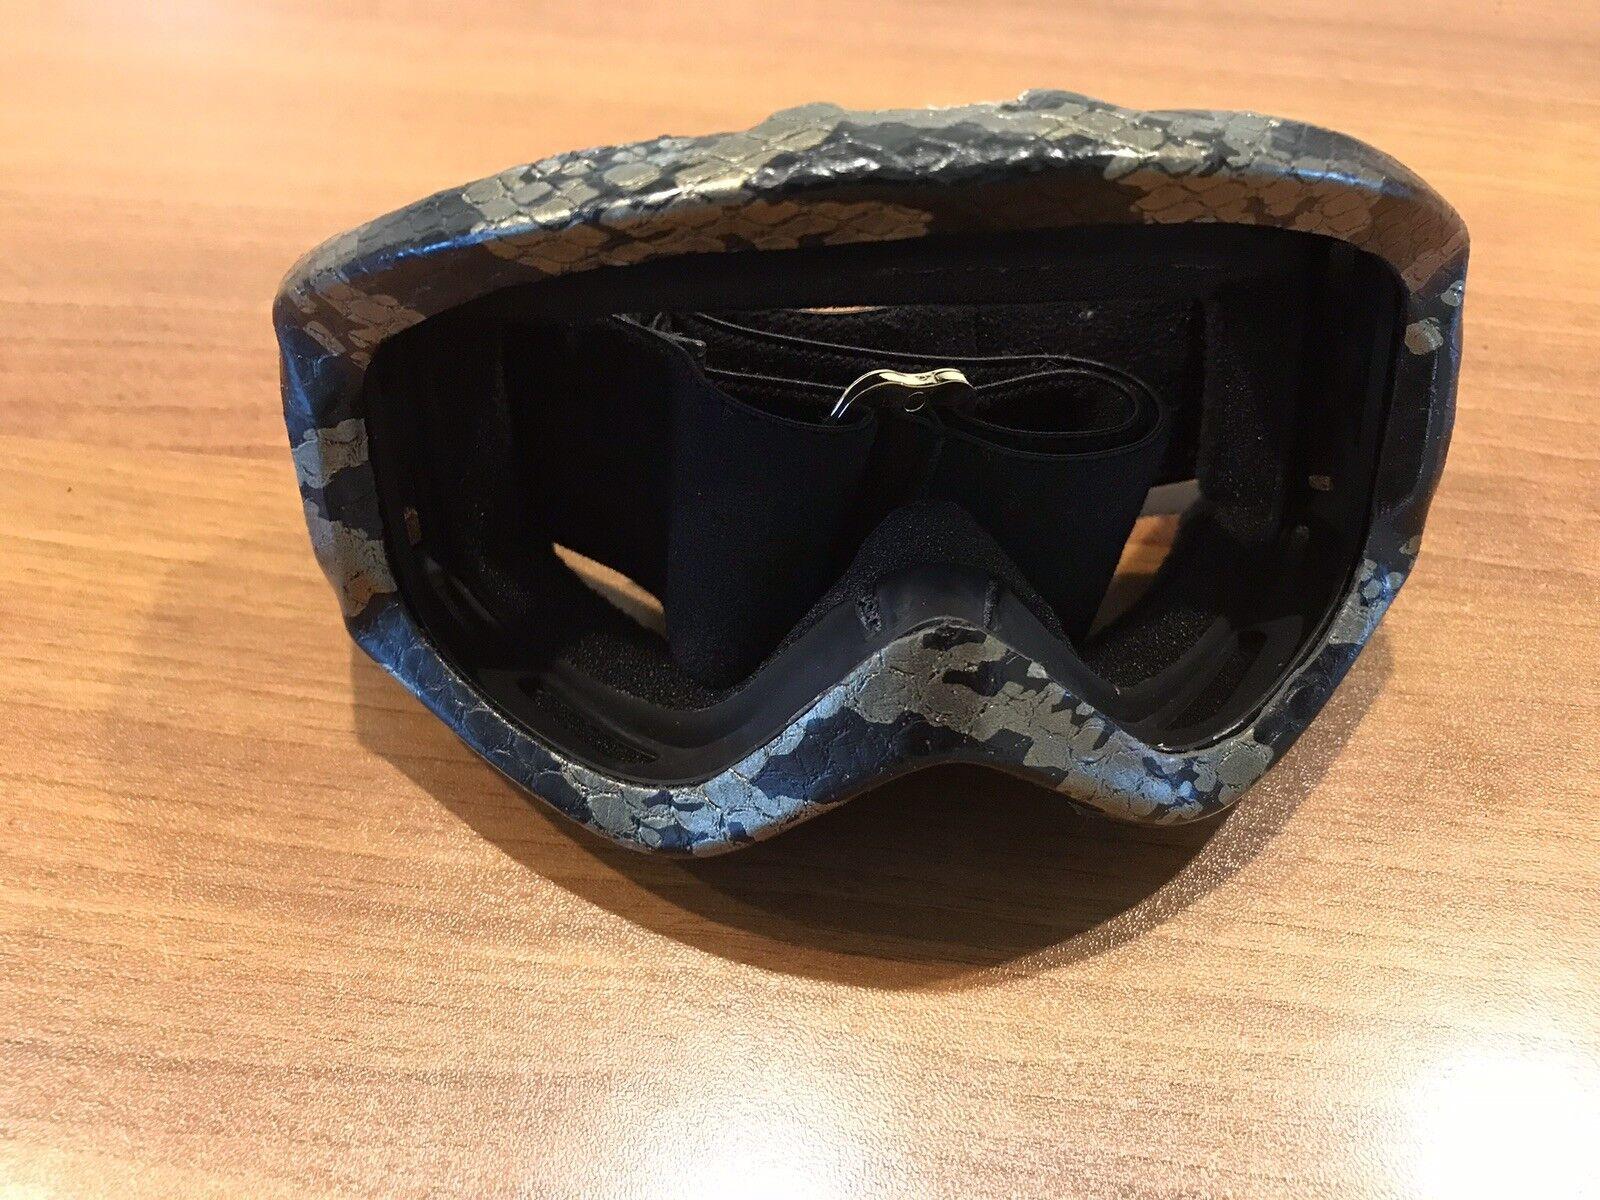 Burton Anon Snowboarding Skiing Goggles SnakeSkin Design